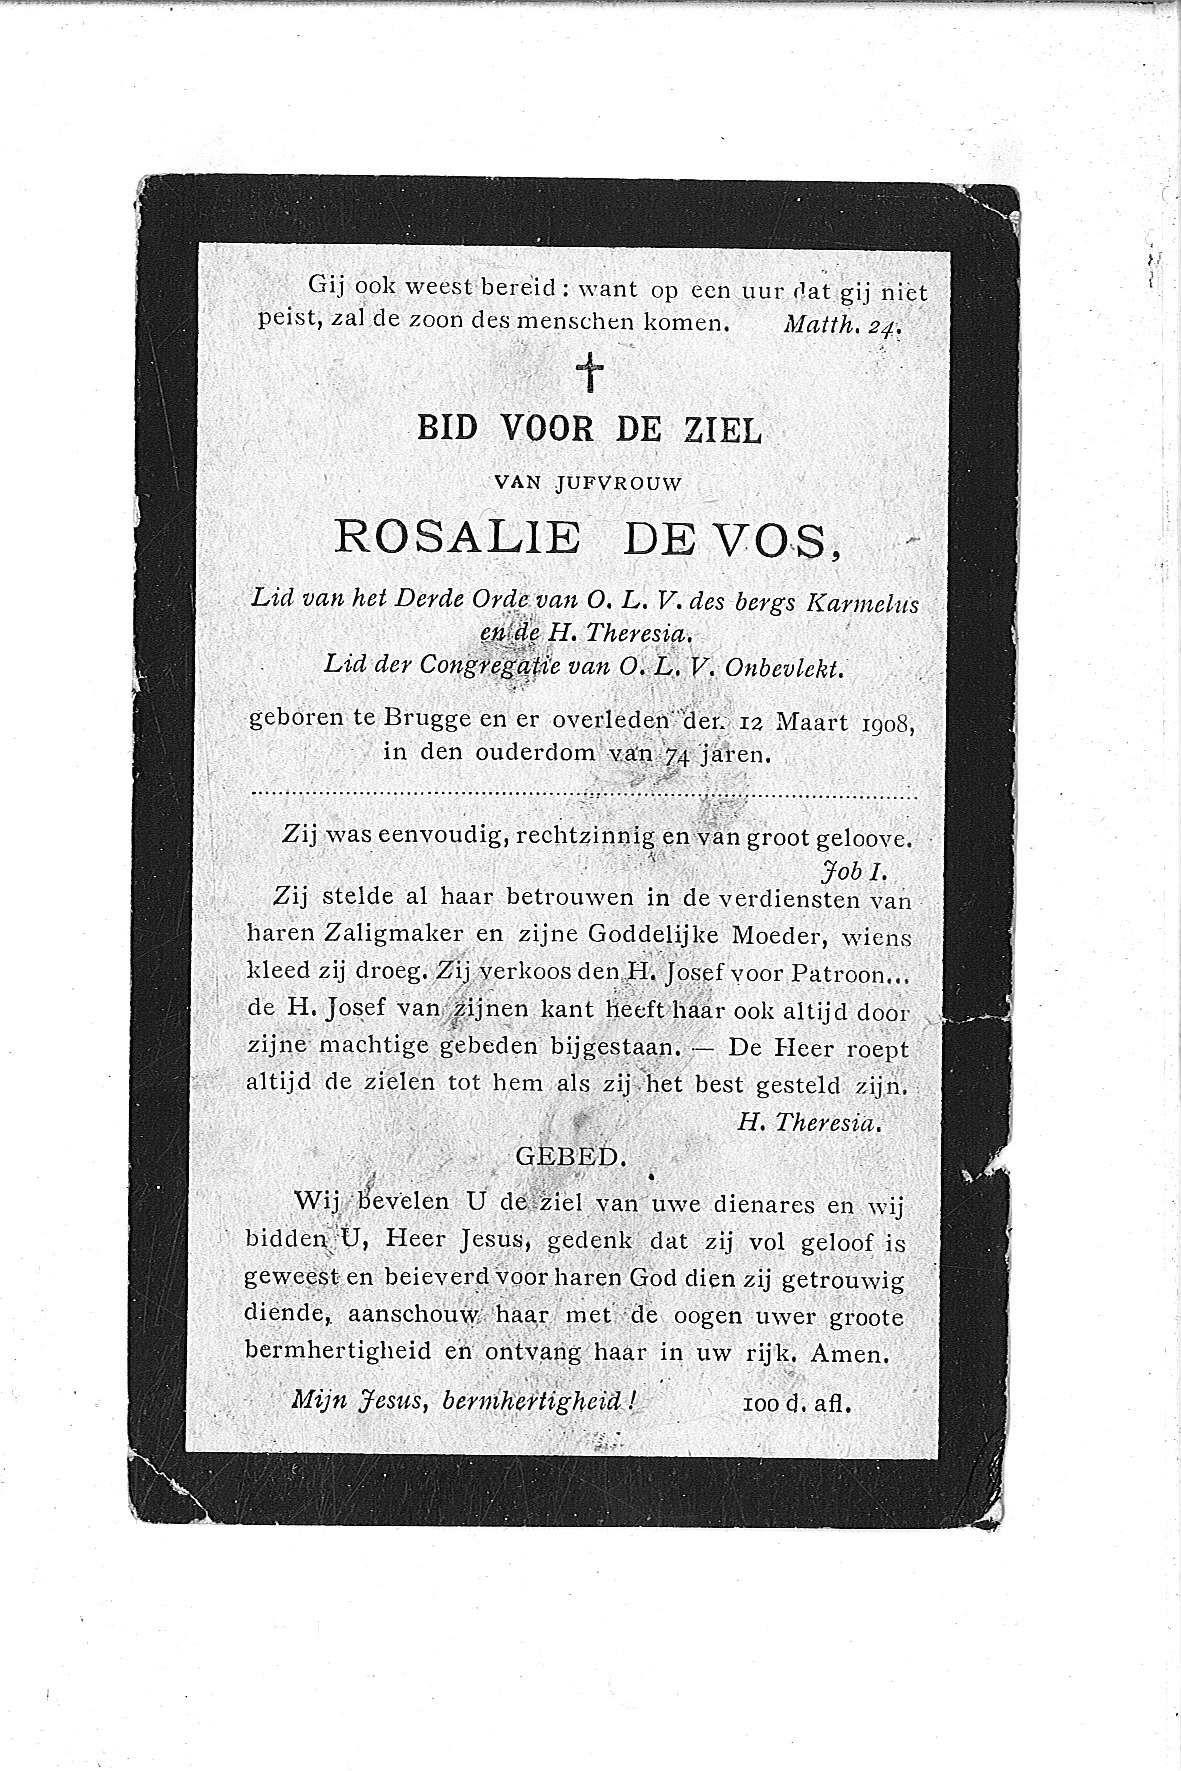 Rosalie (1908) 20120306152925_00135.jpg